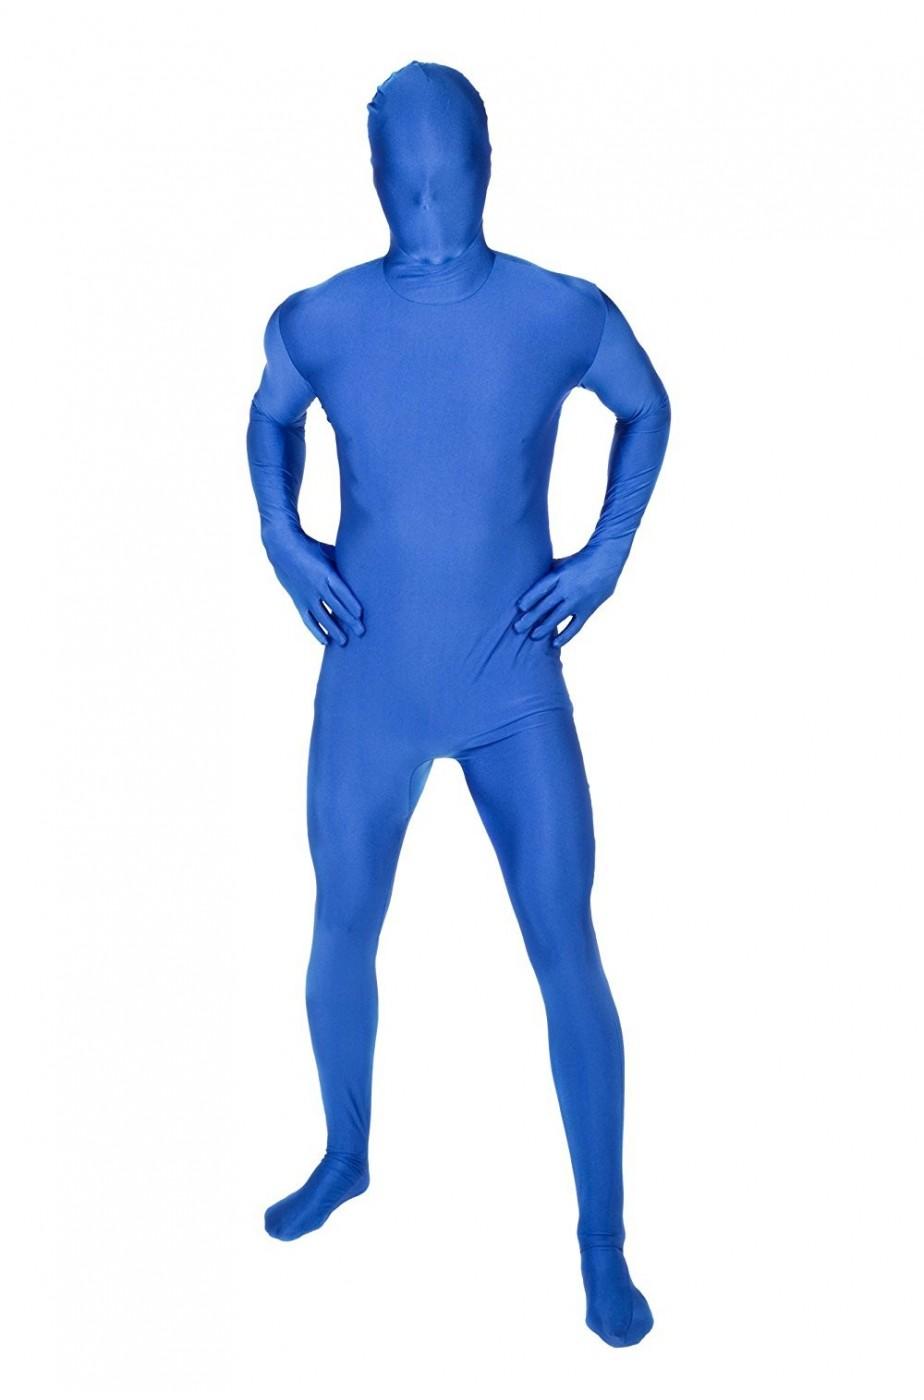 Costume blu morphsuit tuta 2nd skin aderente